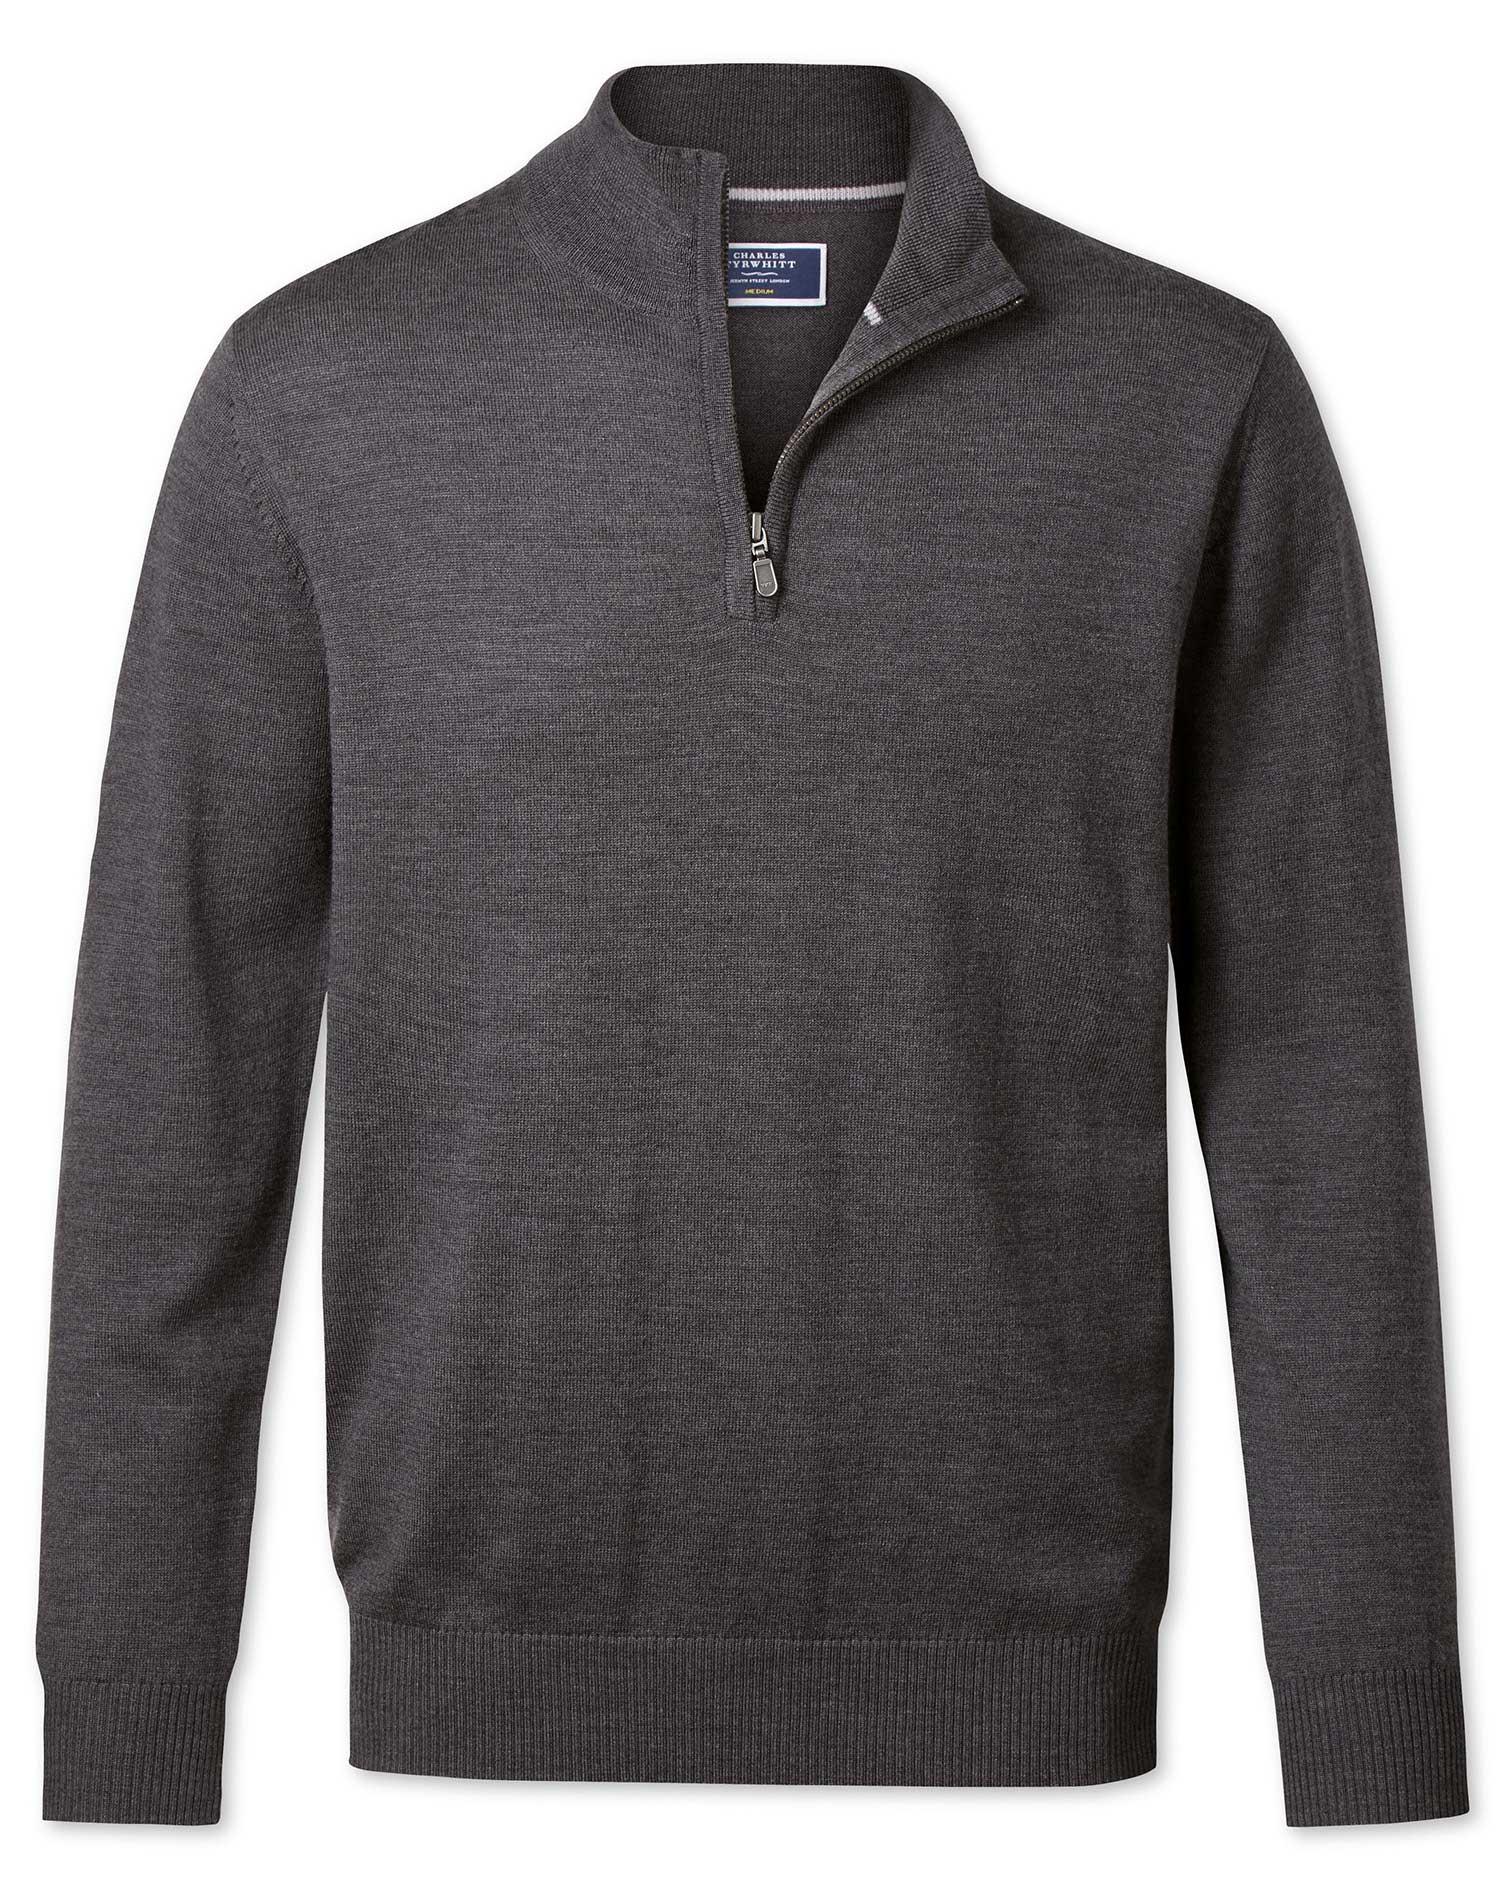 Charcoal Merino Wool Zip Neck Jumper Size XL by Charles Tyrwhitt